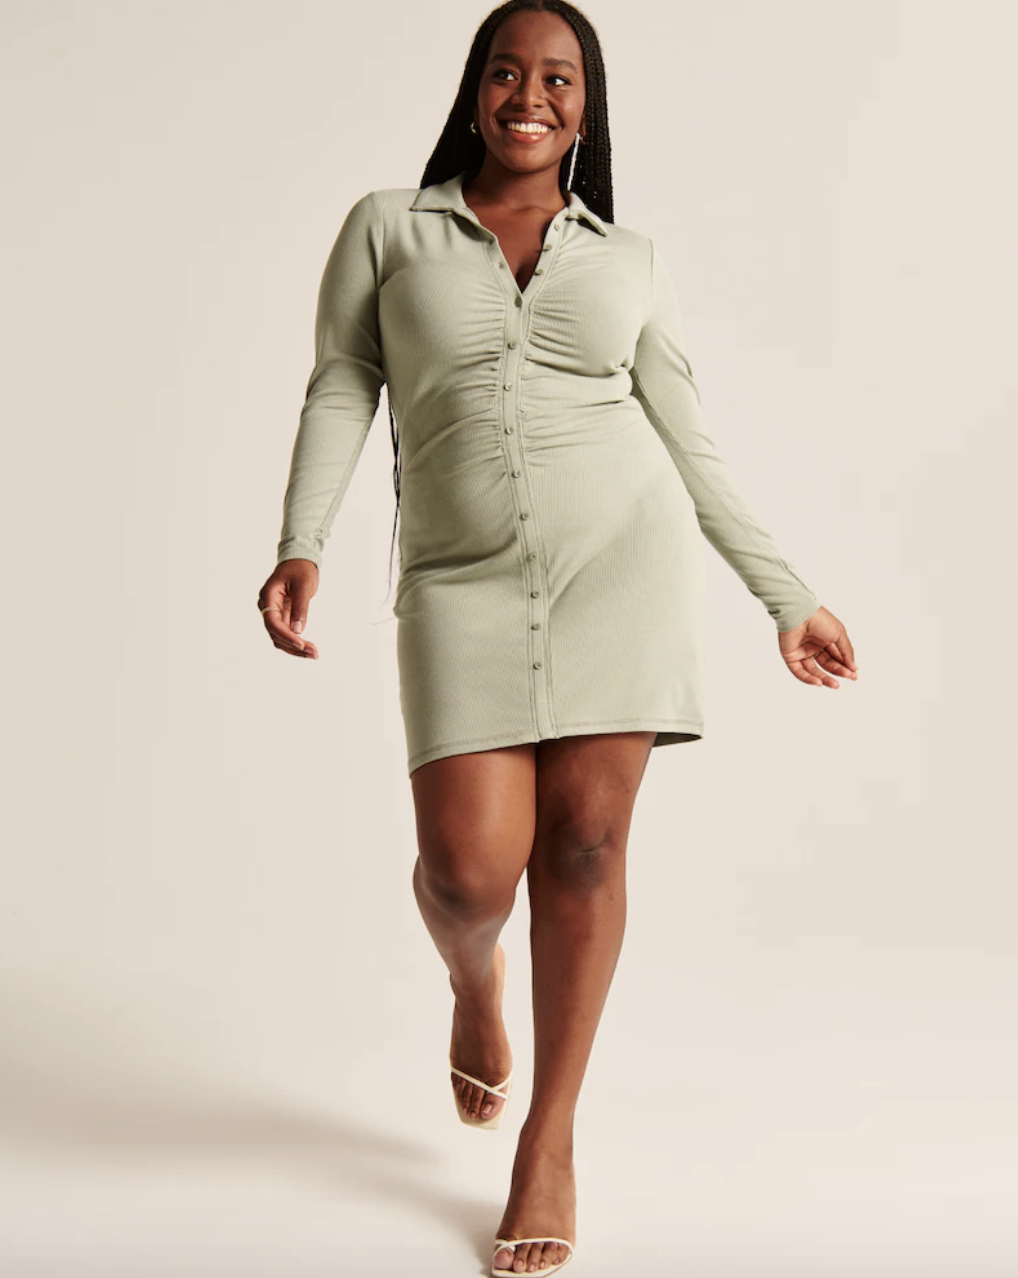 model wearing the green sleeved dress